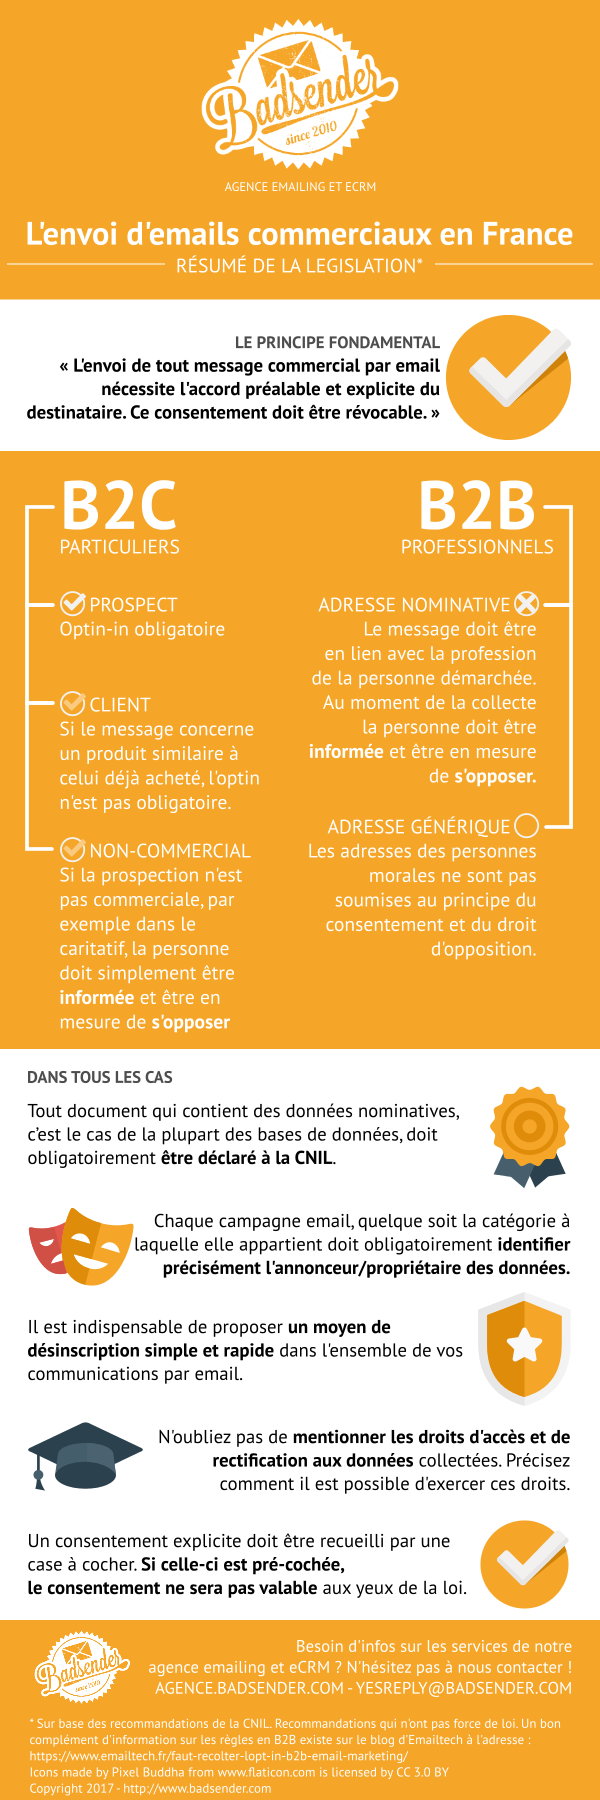 reglementation-francaise-envoi-emailing